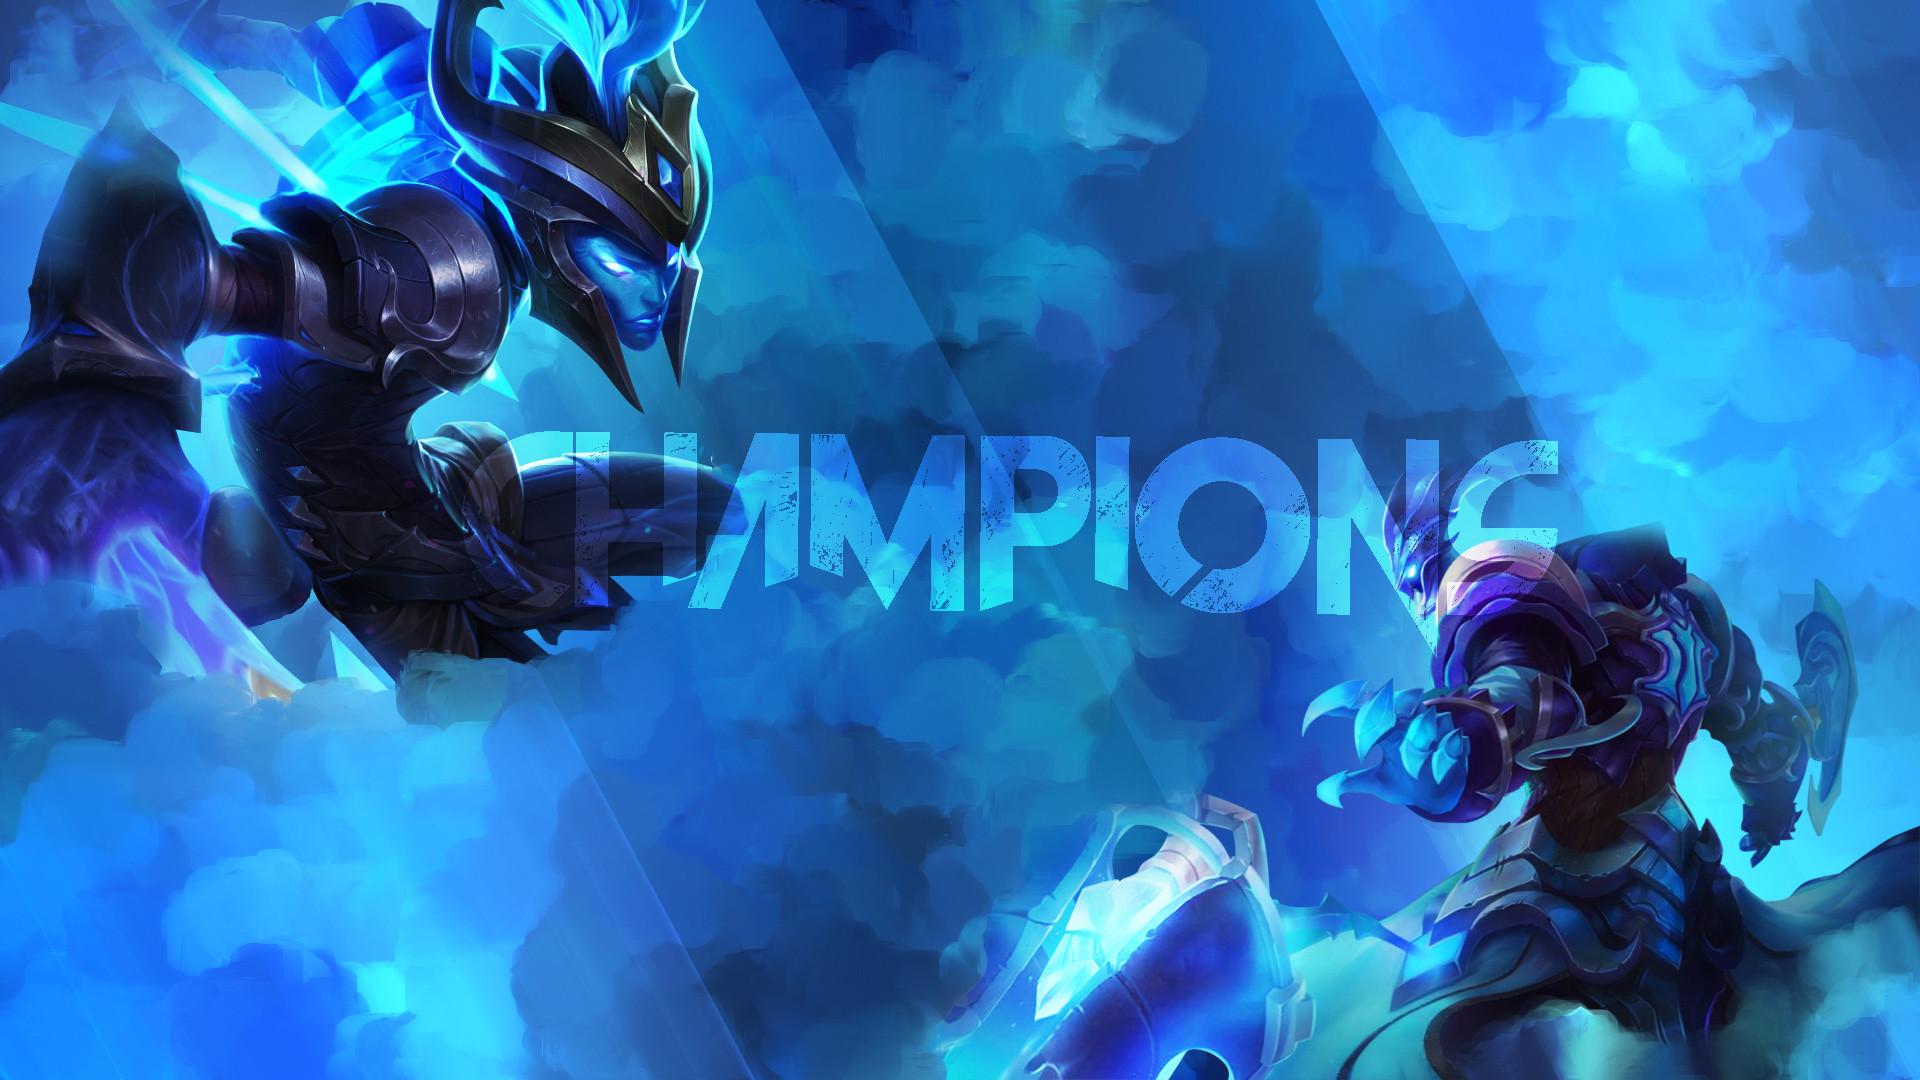 Championship Thresh & Kalista by Platna (2) HD Wallpaper Fan Art Artwork  League of